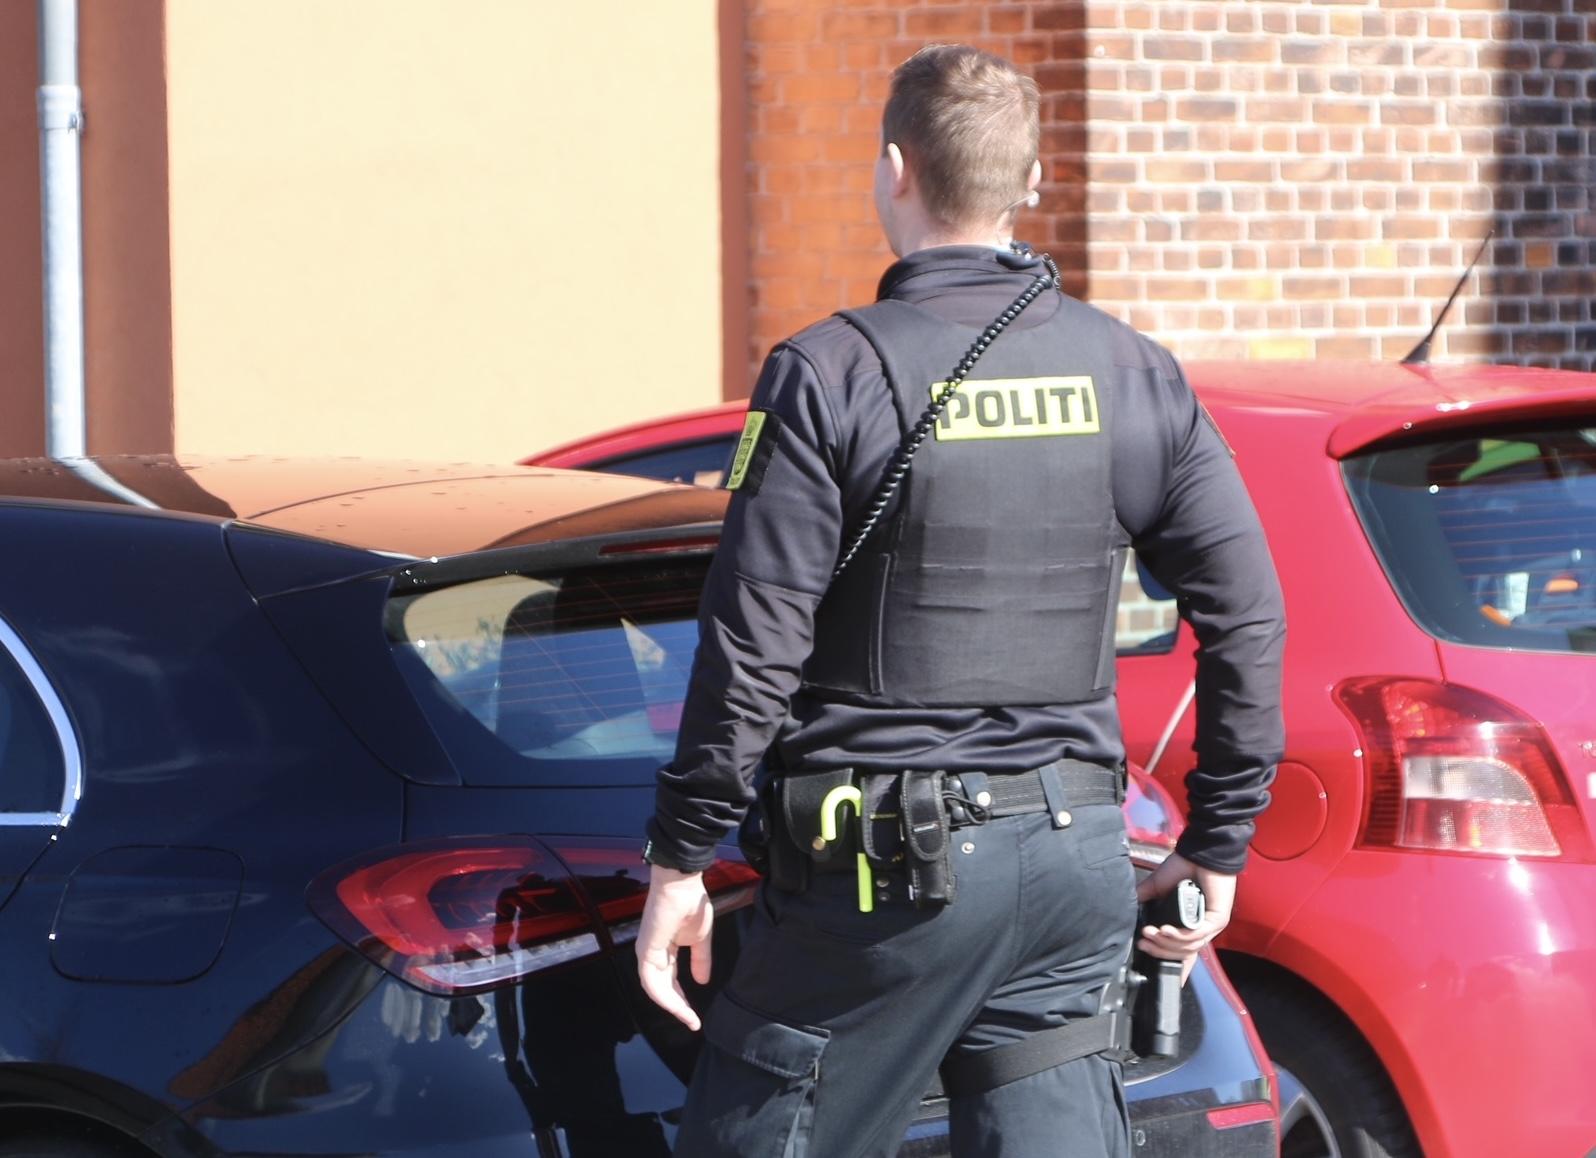 Stor politiaktion i Hvidovre - politi med trukne pistoler